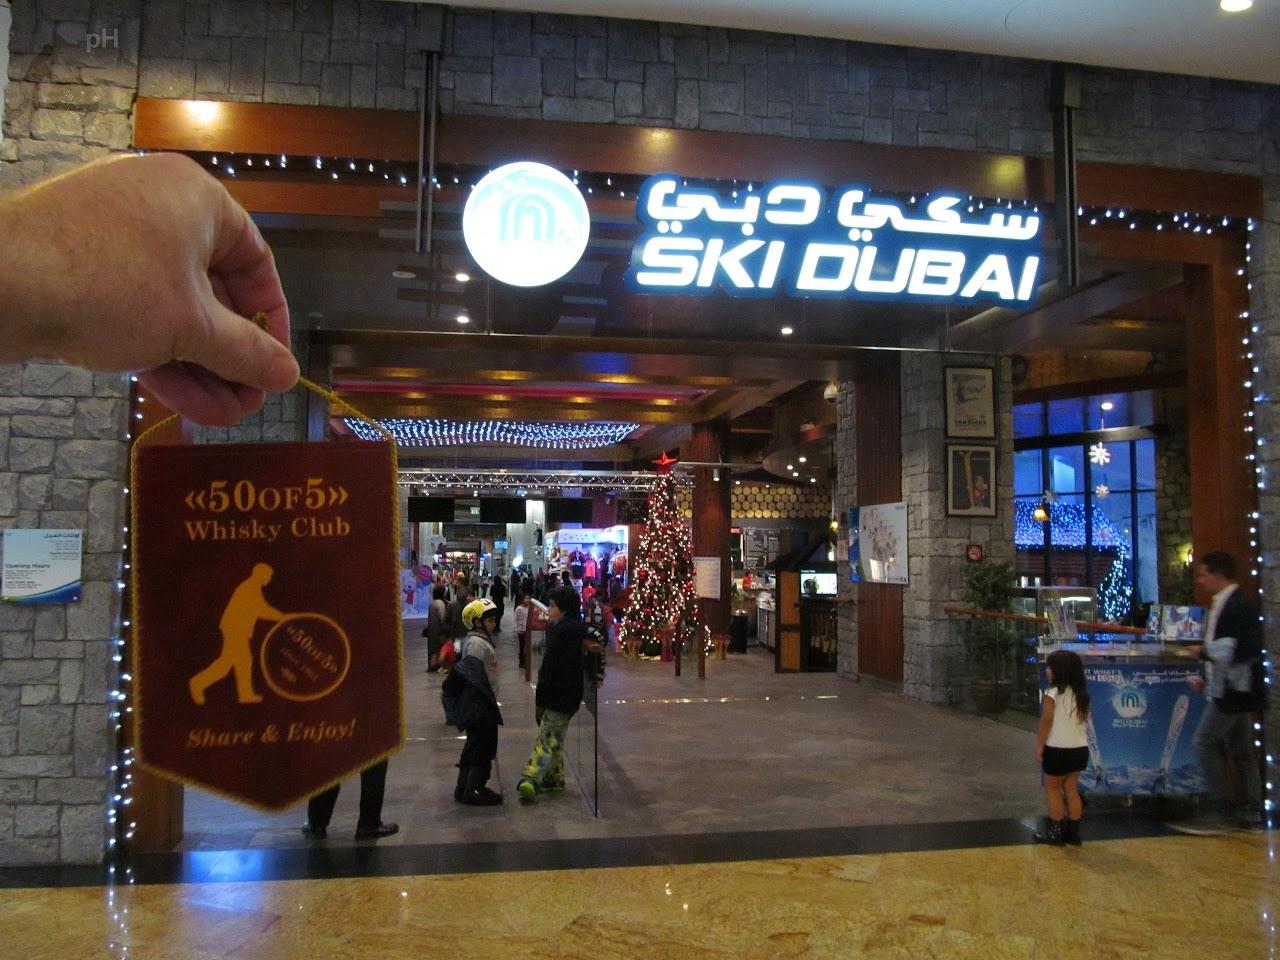 Mall of Emirates - Ski Dubai